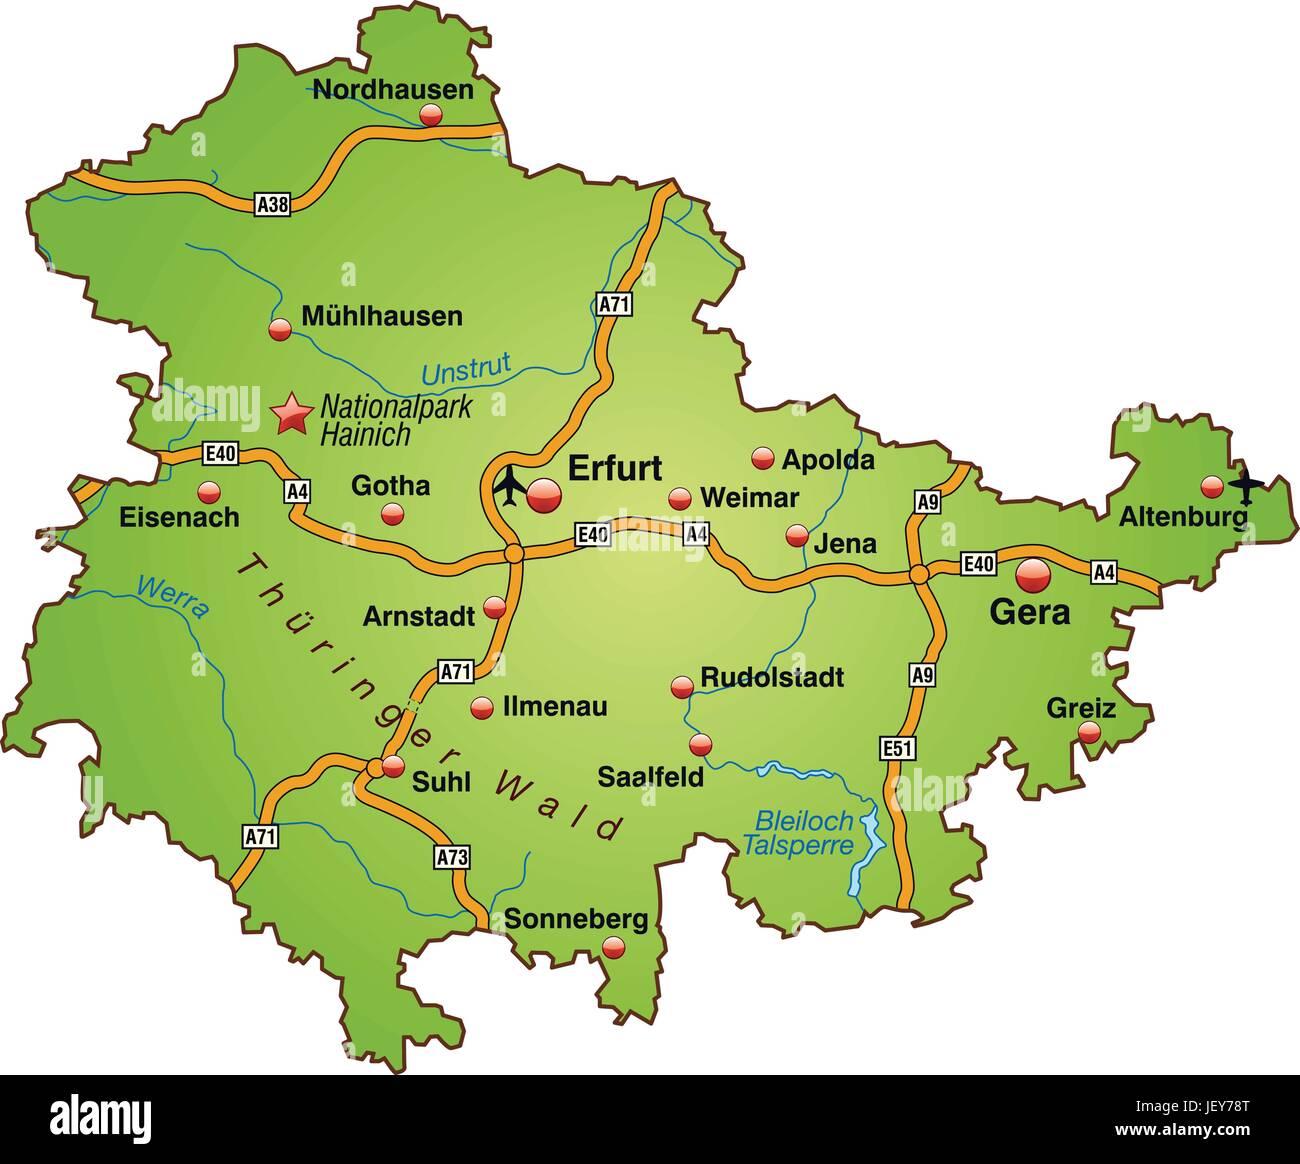 karte thüringen Karte Thüringen Vektor Abbildung   Bild: 146886568   Alamy